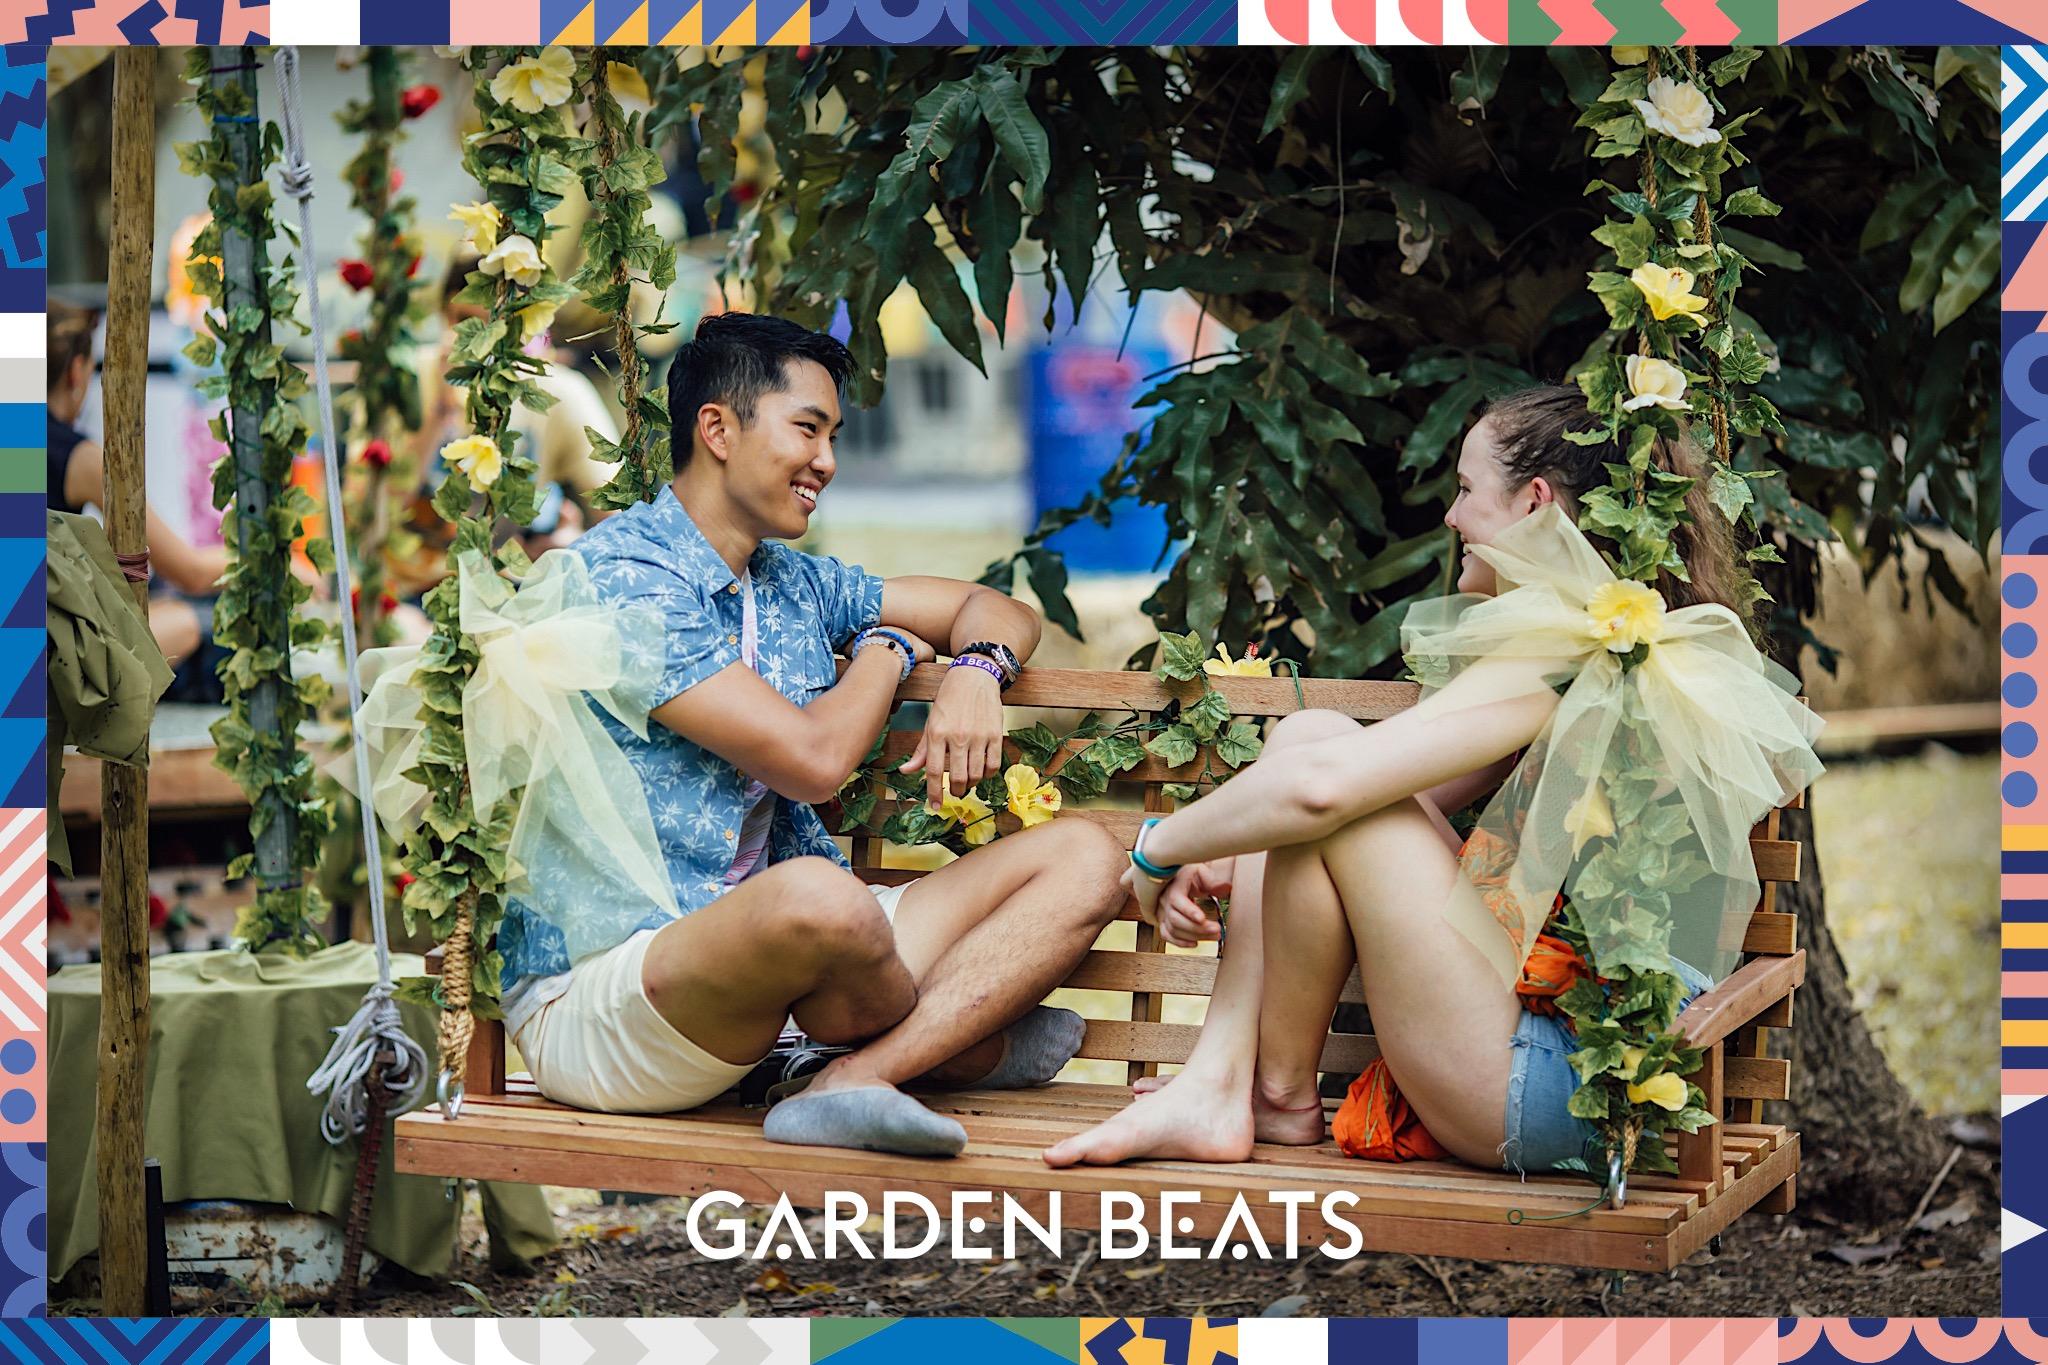 18032017_GardenBeats_Colossal146_WatermarkedGB.jpg